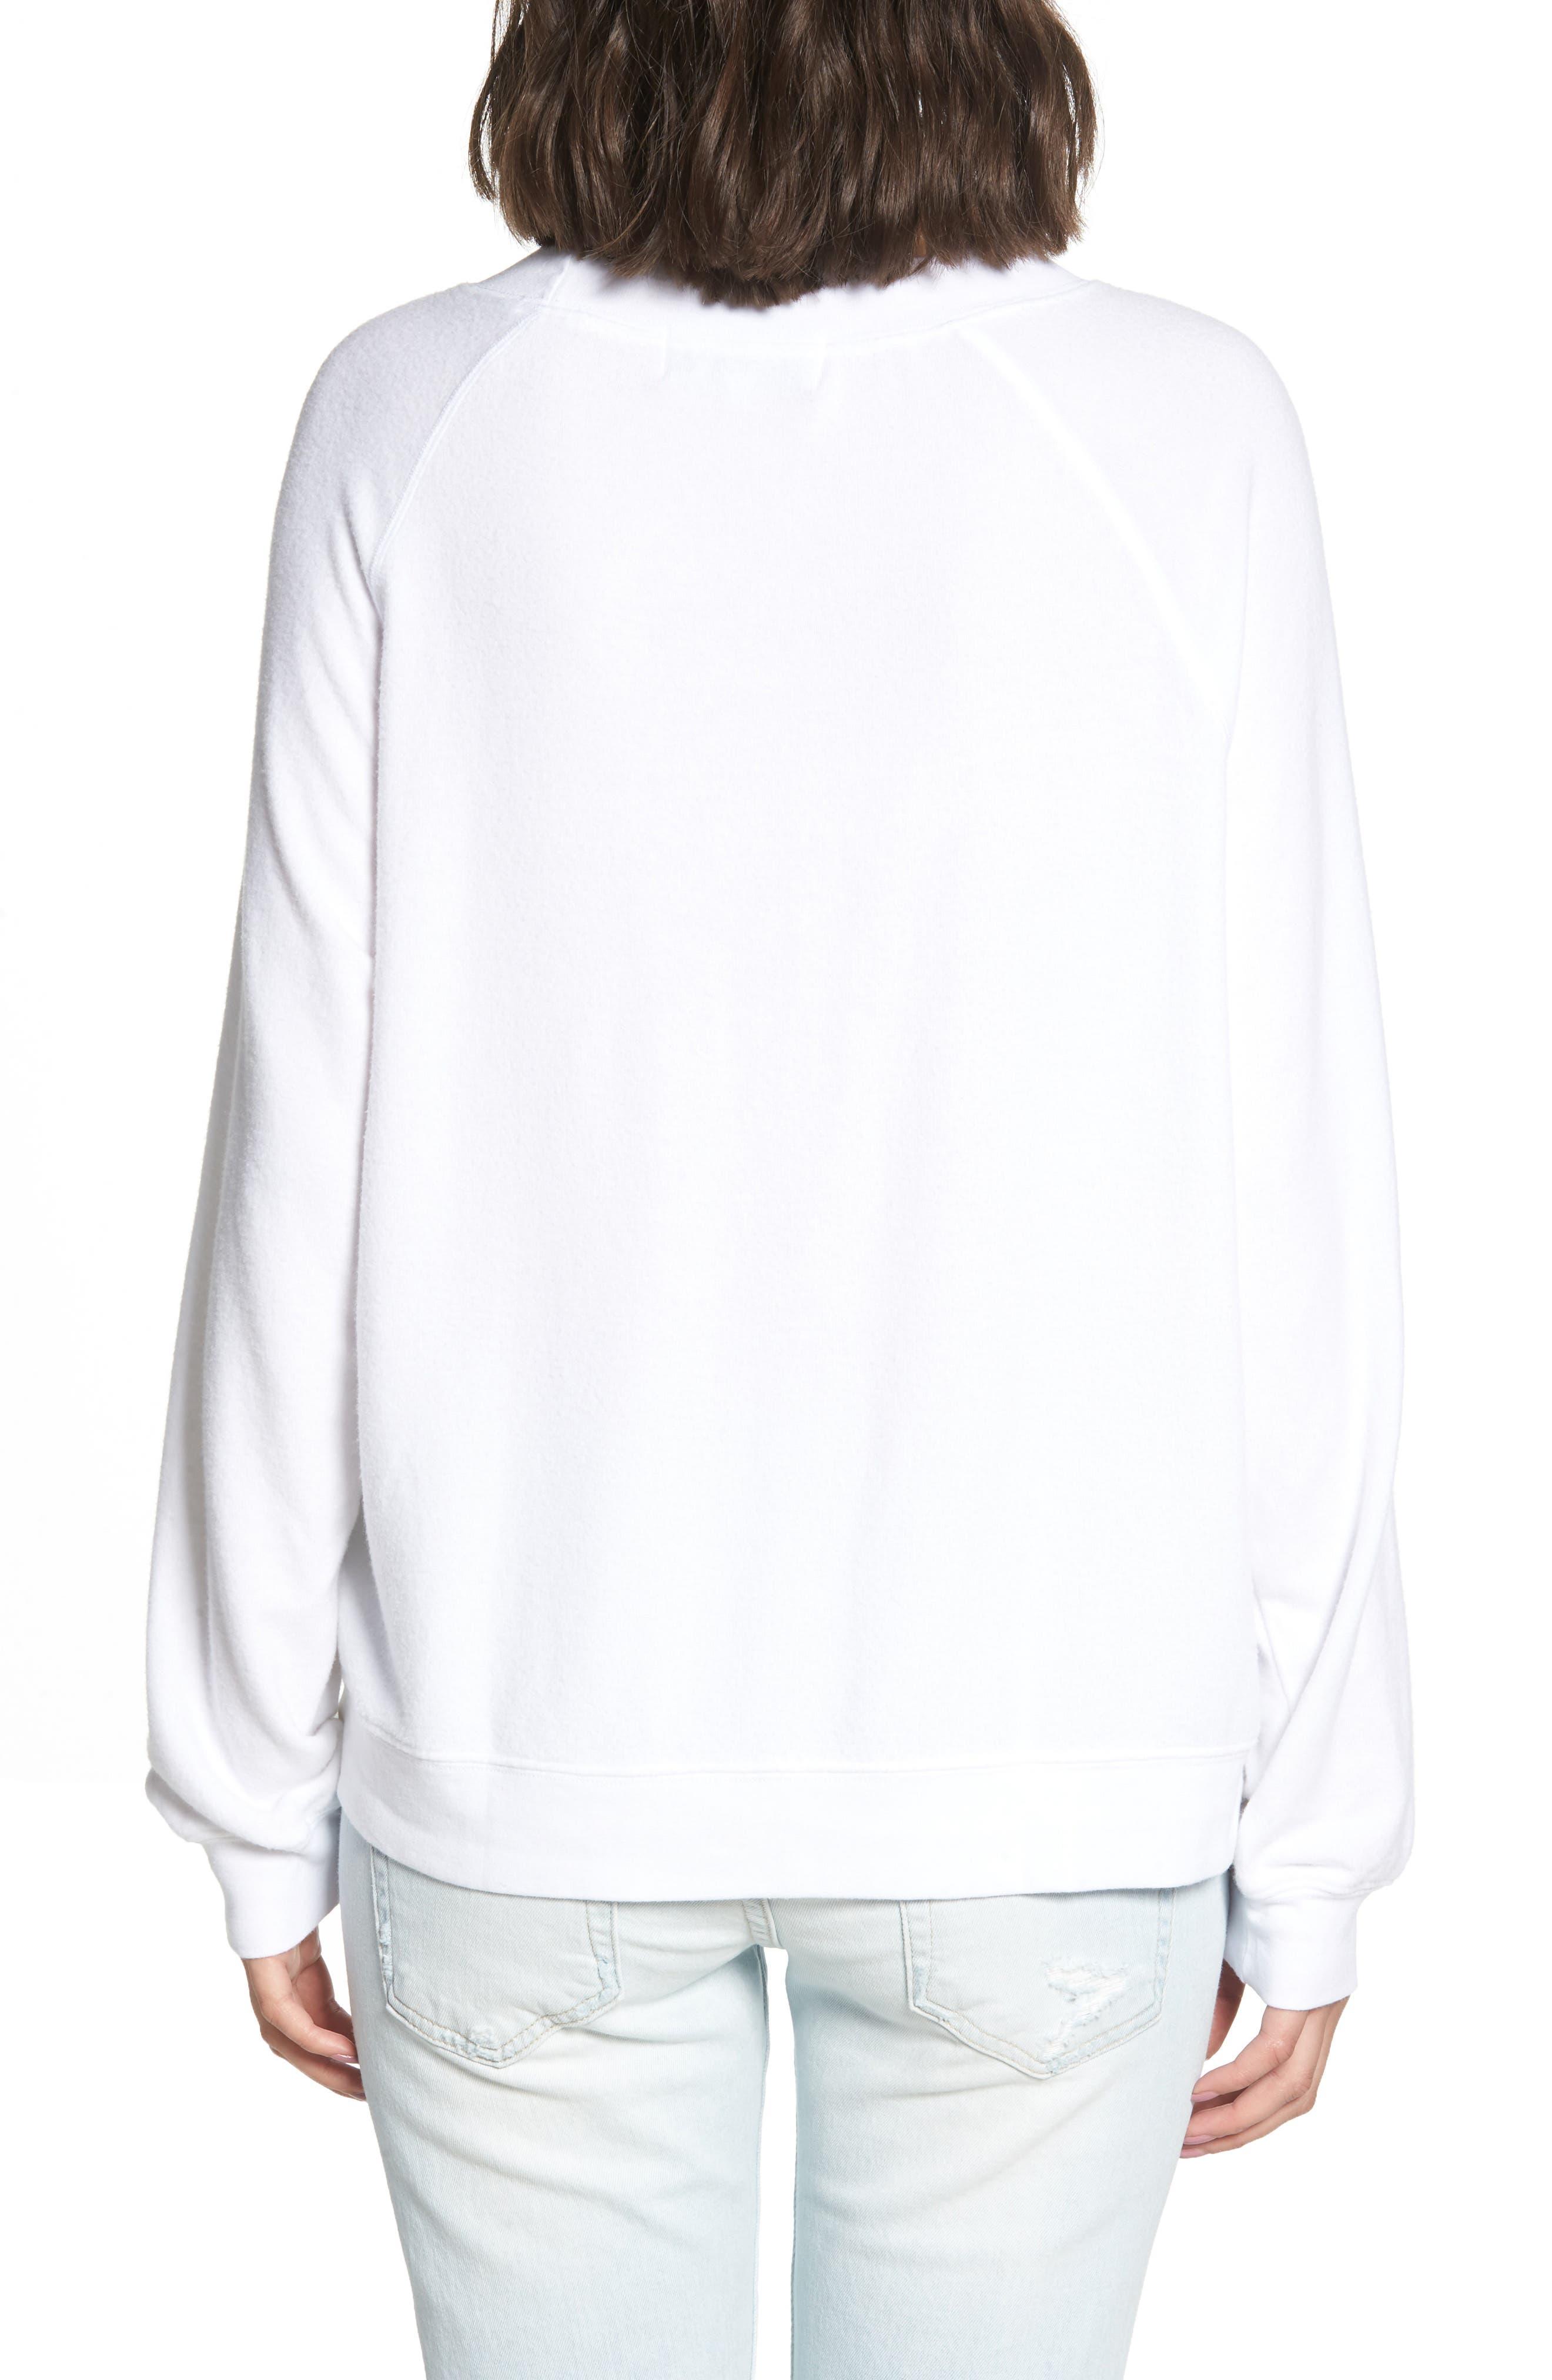 Sunshine Diet Sommers Sweatshirt,                             Alternate thumbnail 2, color,                             CLEAN WHITE